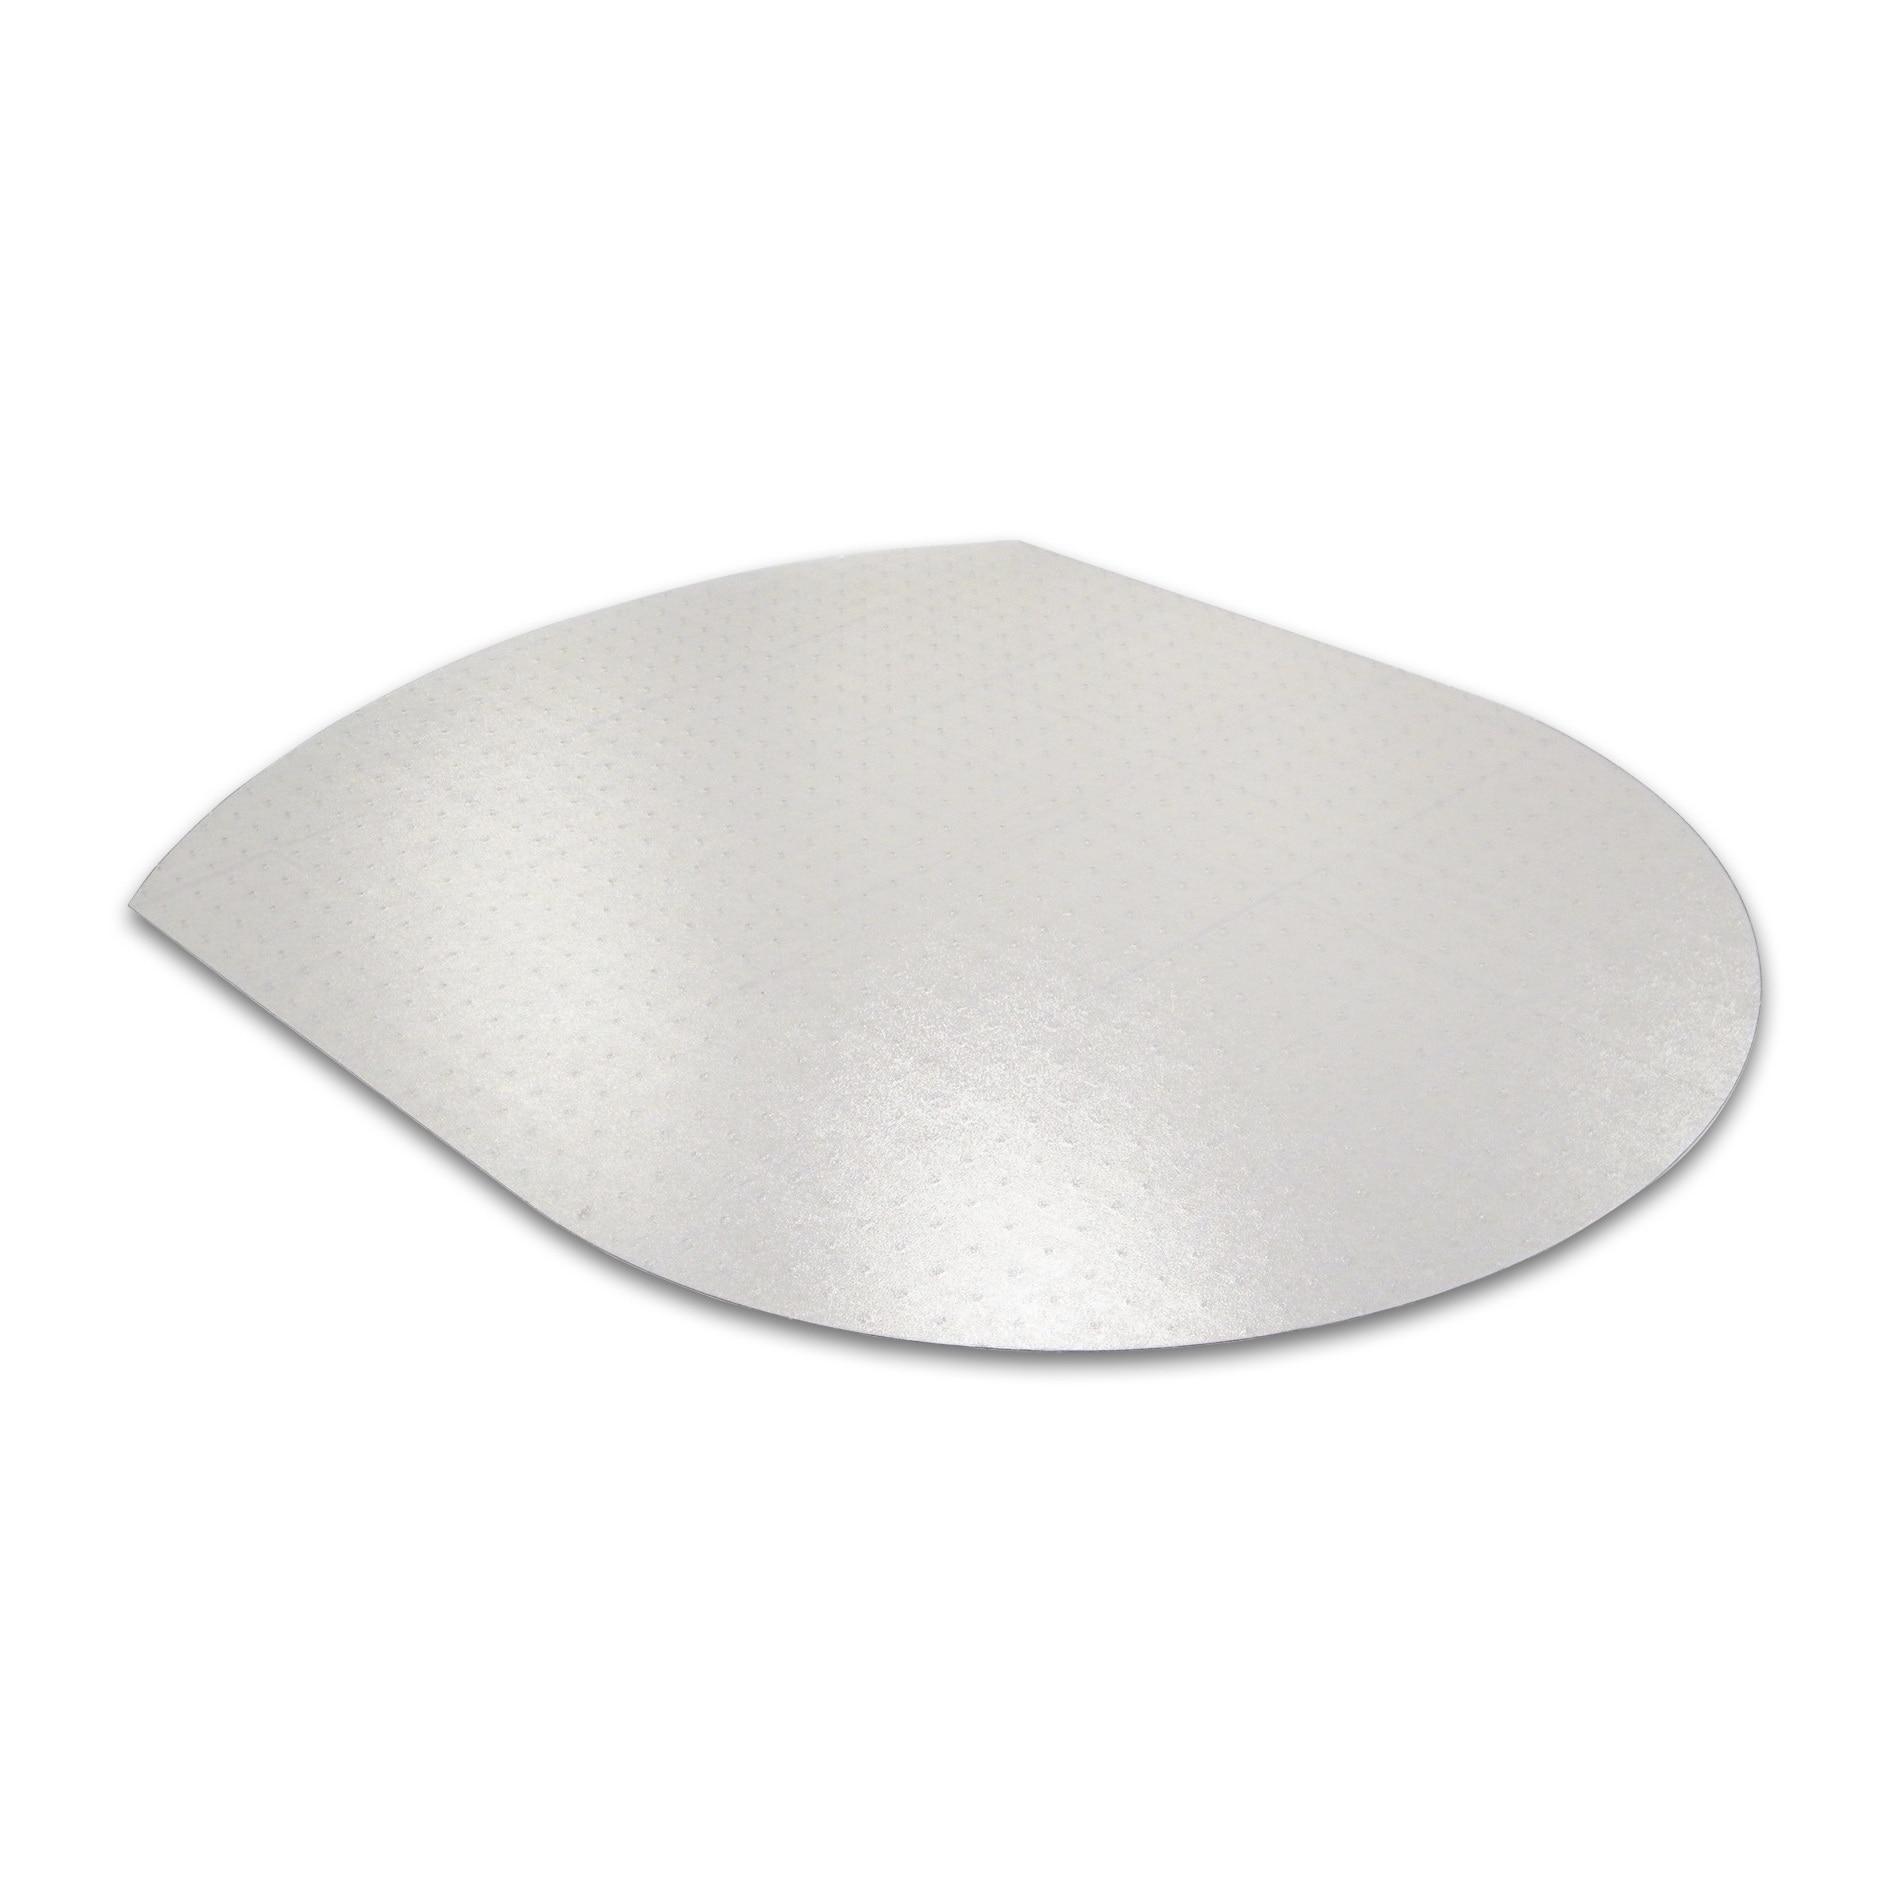 shop cleartex ultimat contoured chair mat polycarbonate for low